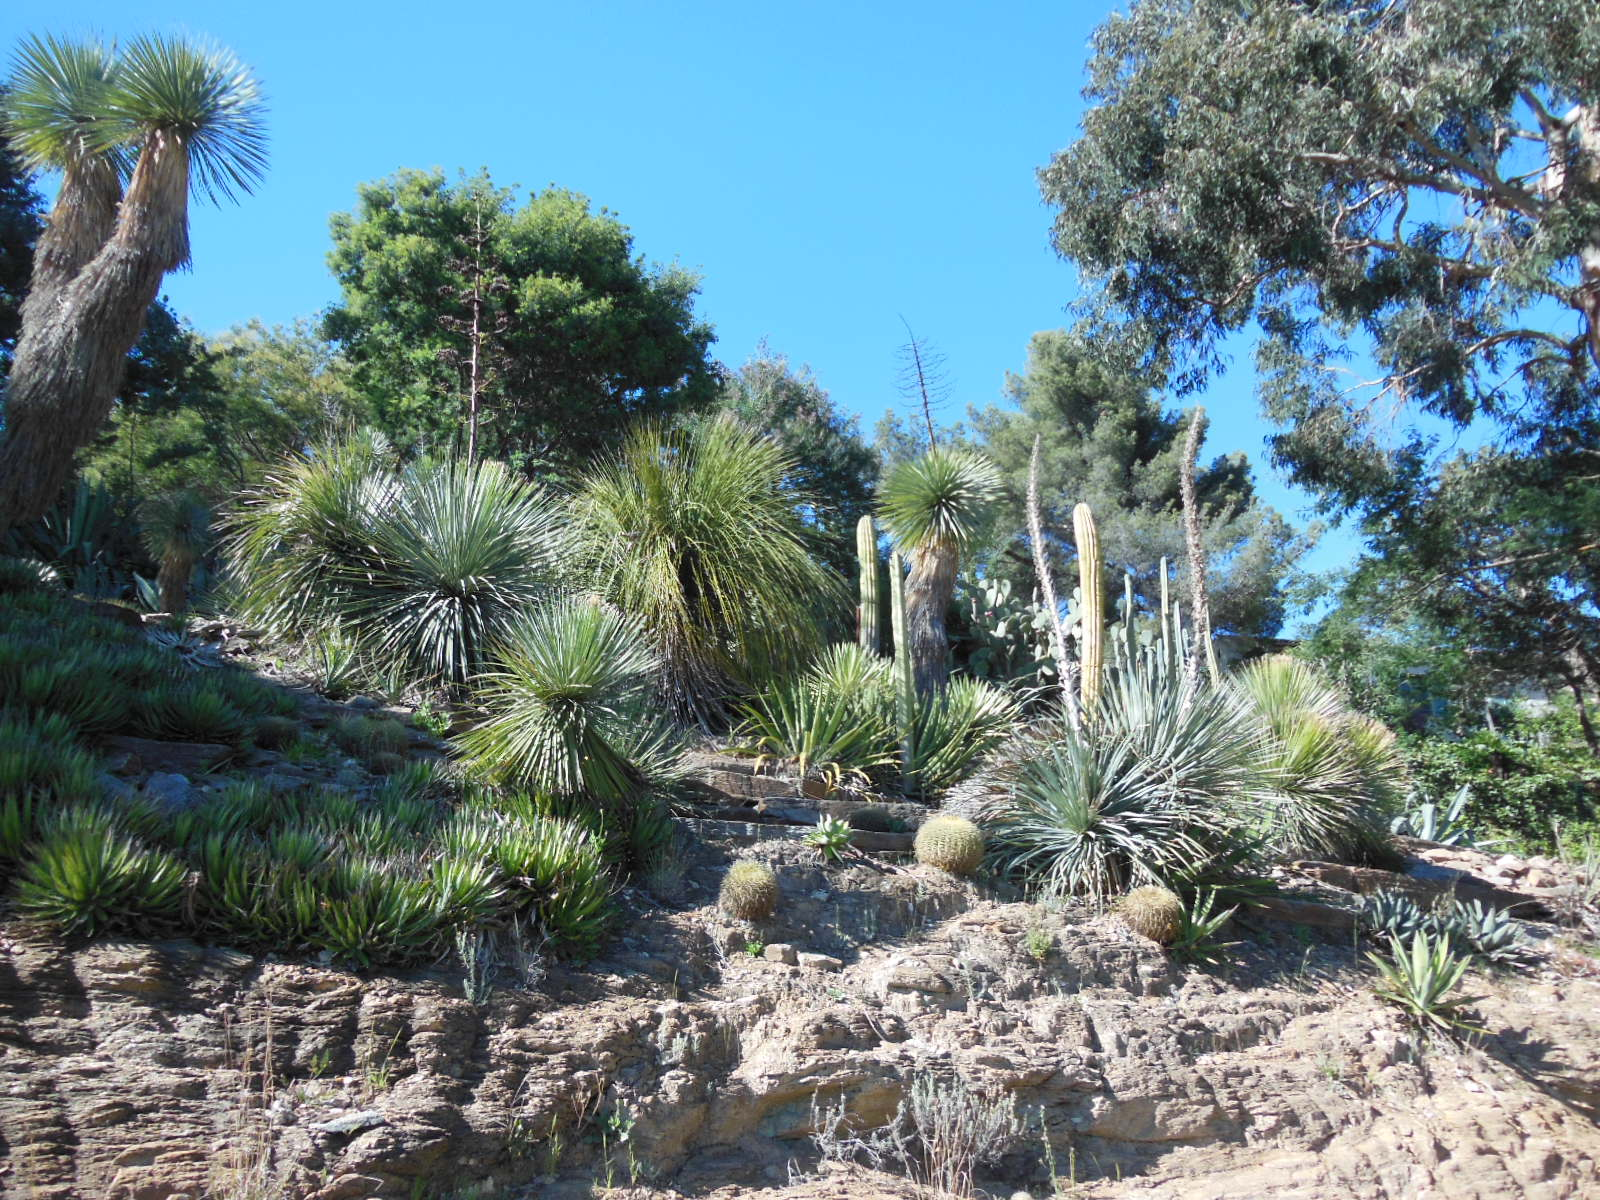 Domaine Du Rayol Le Jardin Des Mediterranees A Rayol Canadel Sur Mer